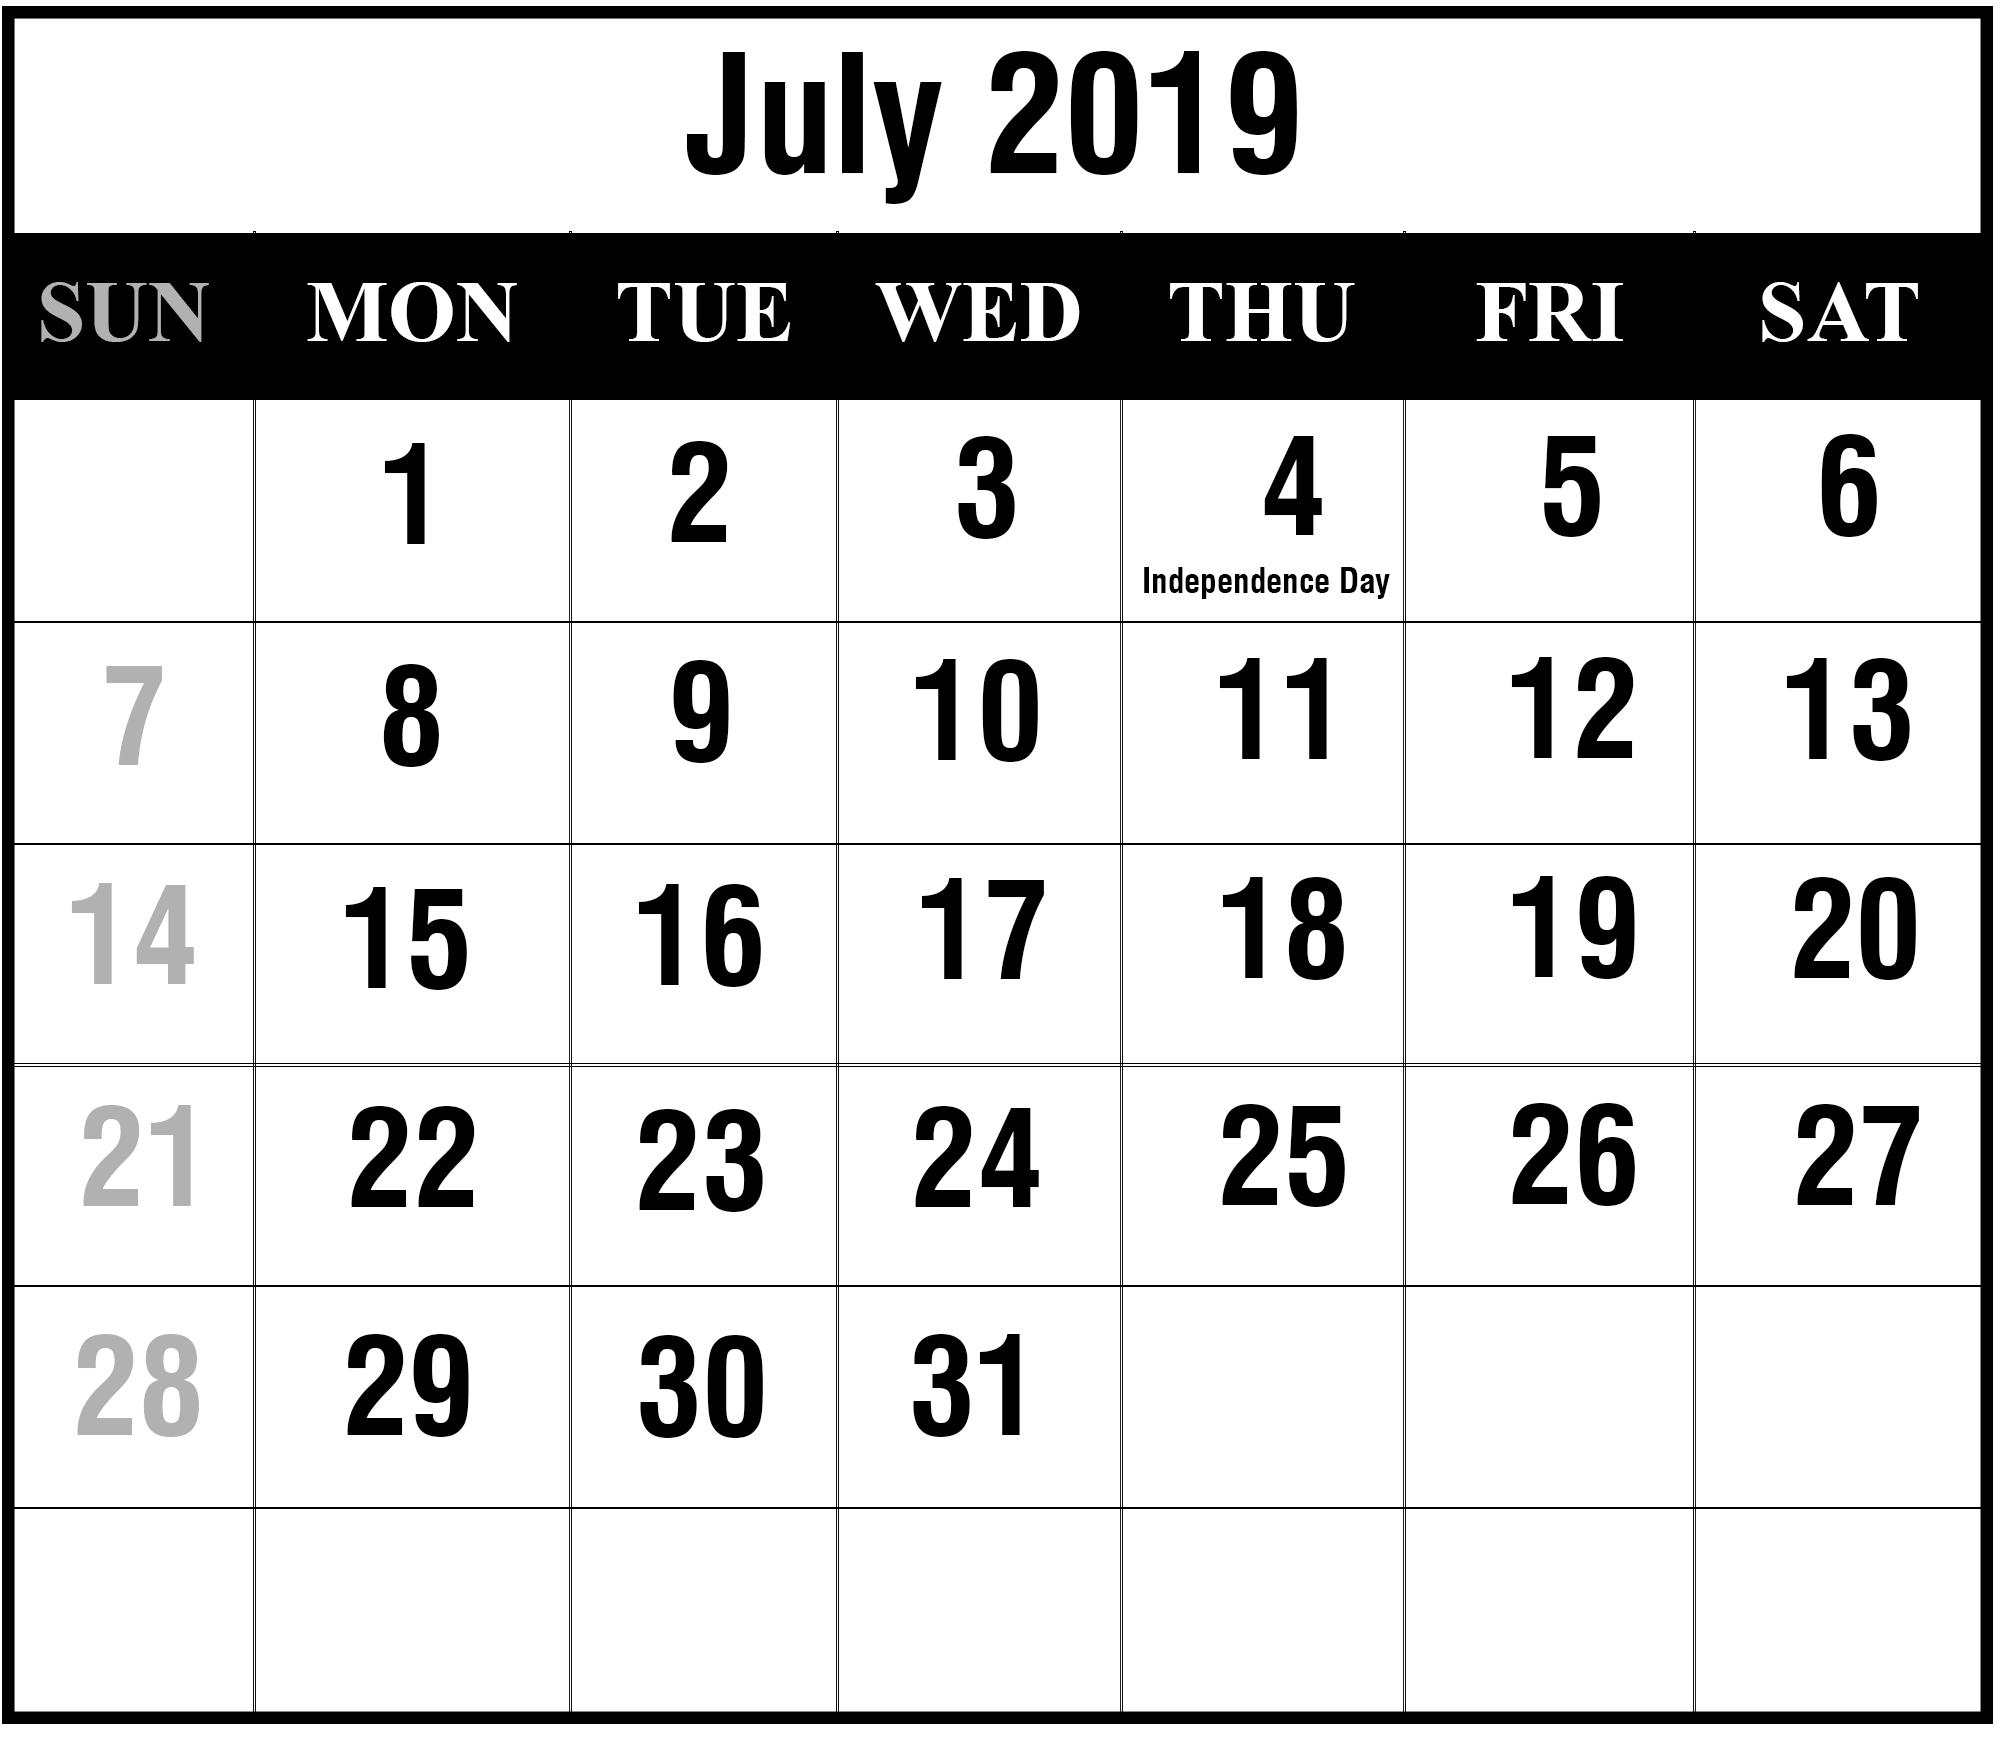 July 2019 Calendar Printable | July Blank Calendar Template Calendar July 4 2019